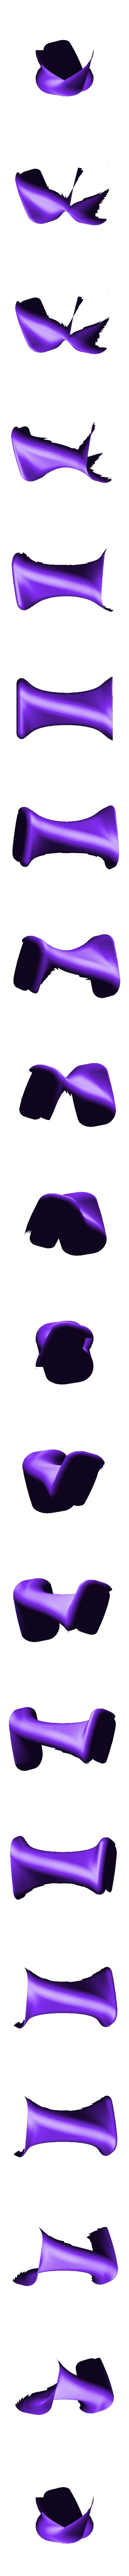 Maceta Curva.STL Télécharger fichier STL gratuit Pot courbe • Modèle à imprimer en 3D, joakinfontana